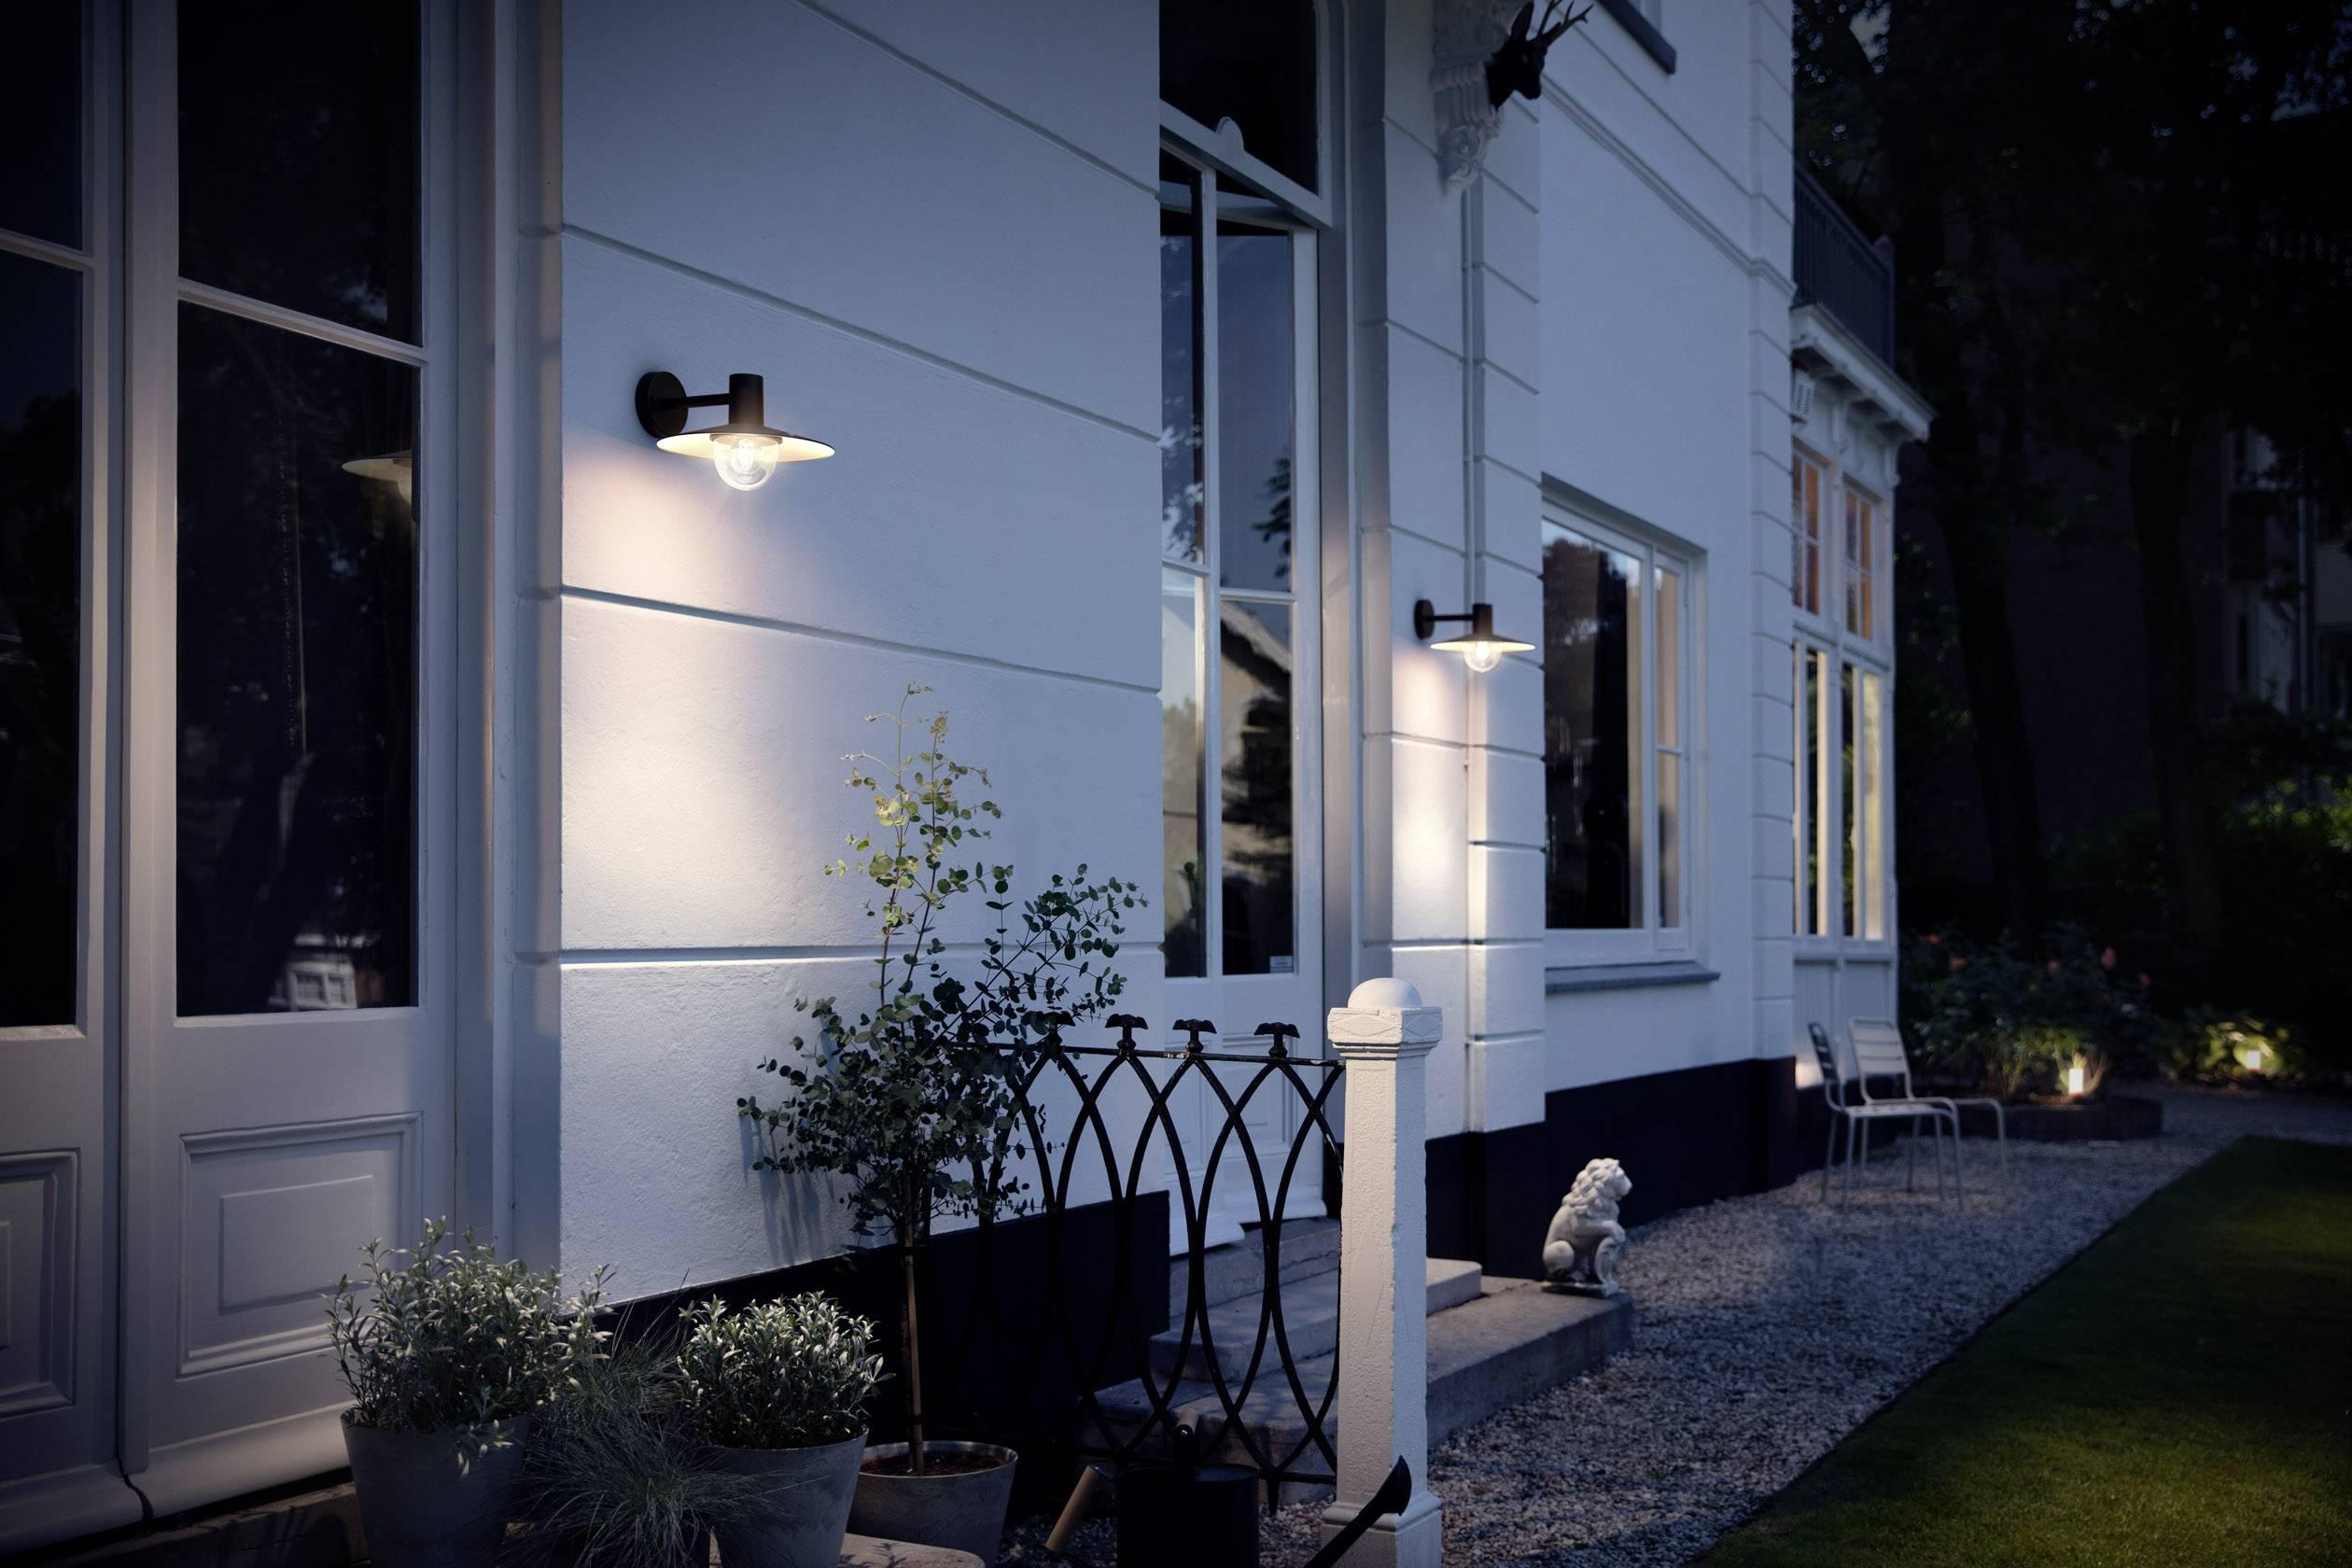 Philips skua pn outdoor wall light led e w eec